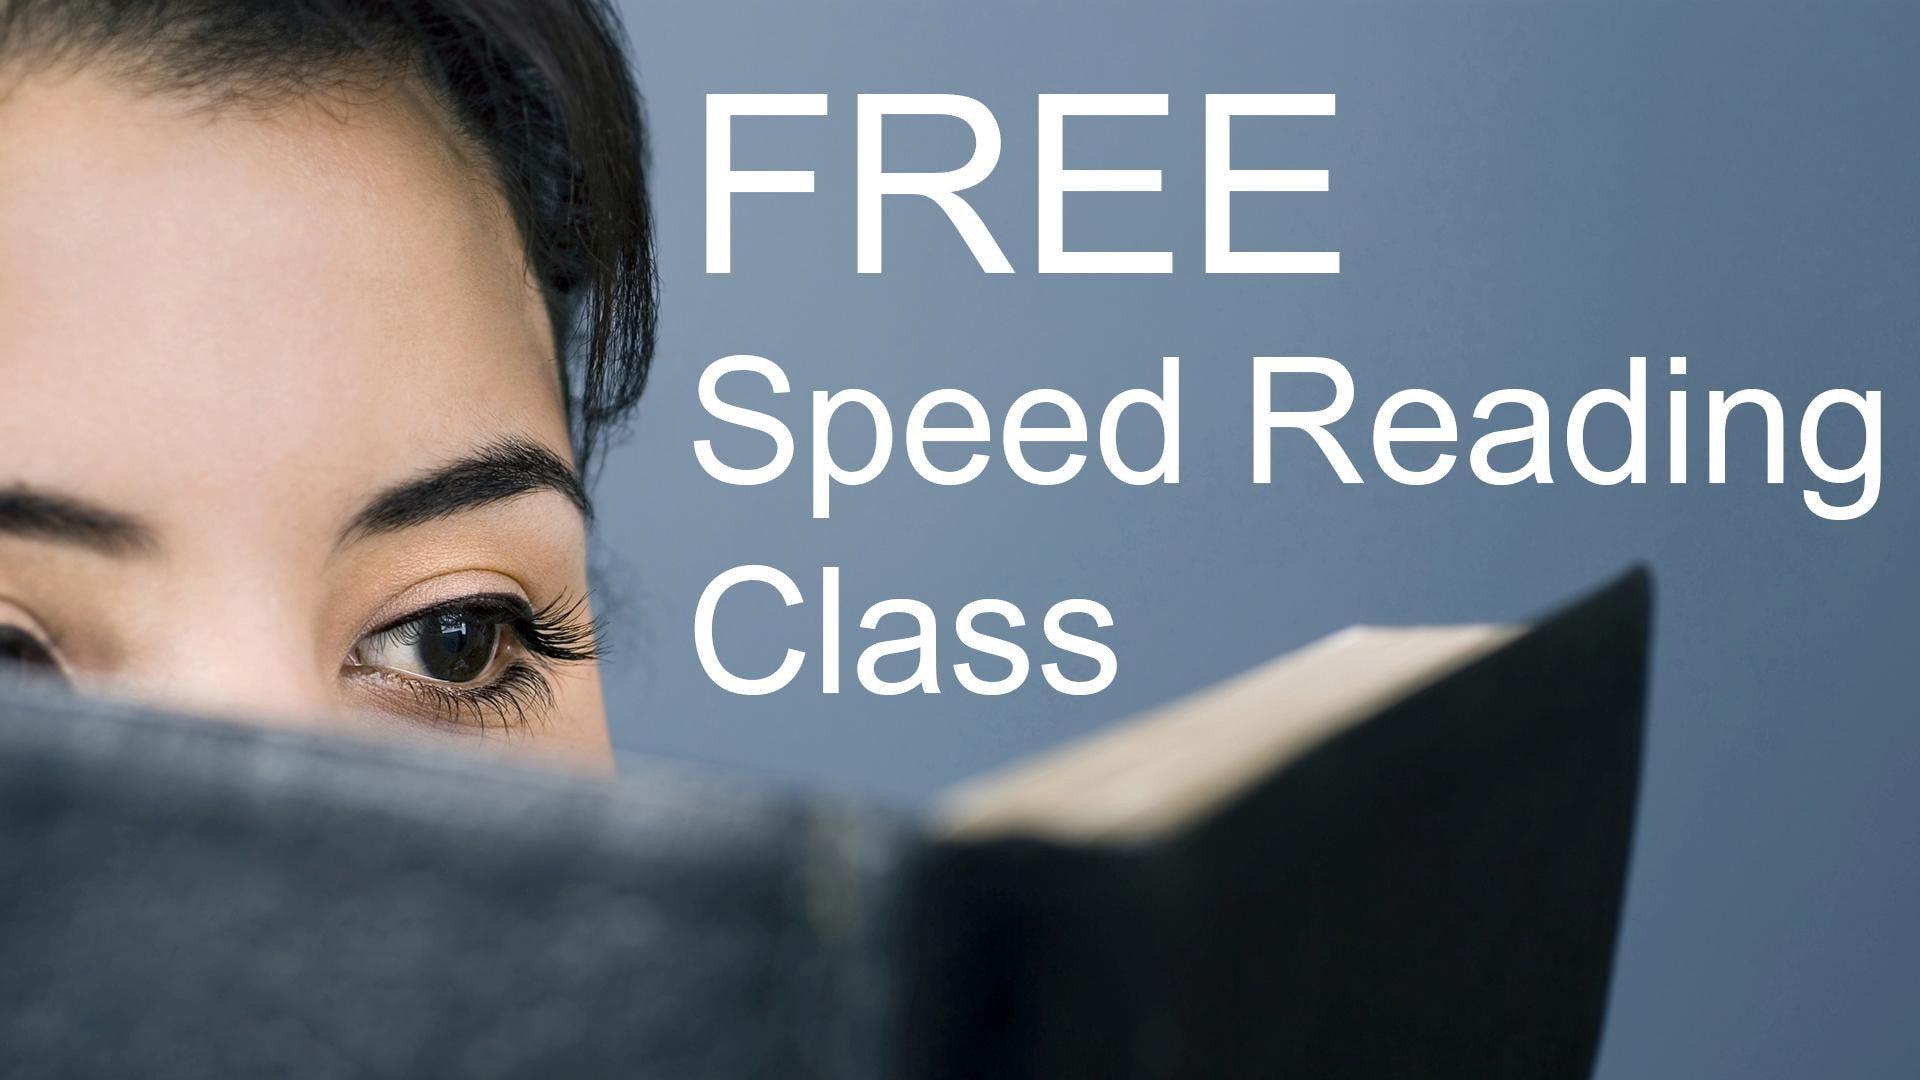 Free Speed Reading Class - San Antonio